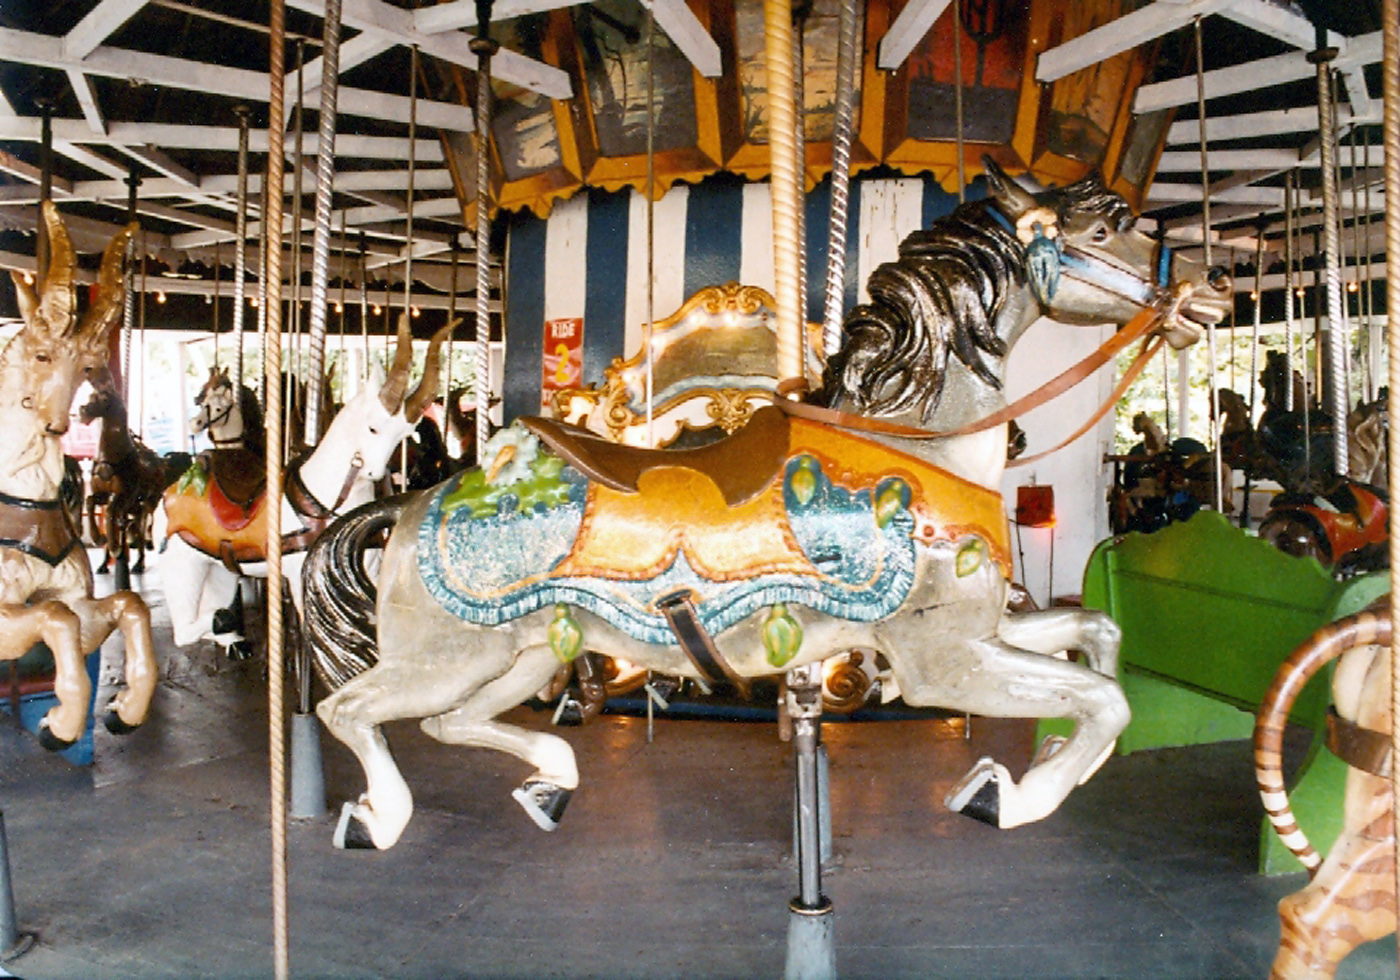 1902-E-Joy-Morris-Menagerie-Carousel-Quassy-Lake-Park-1979-photos-035